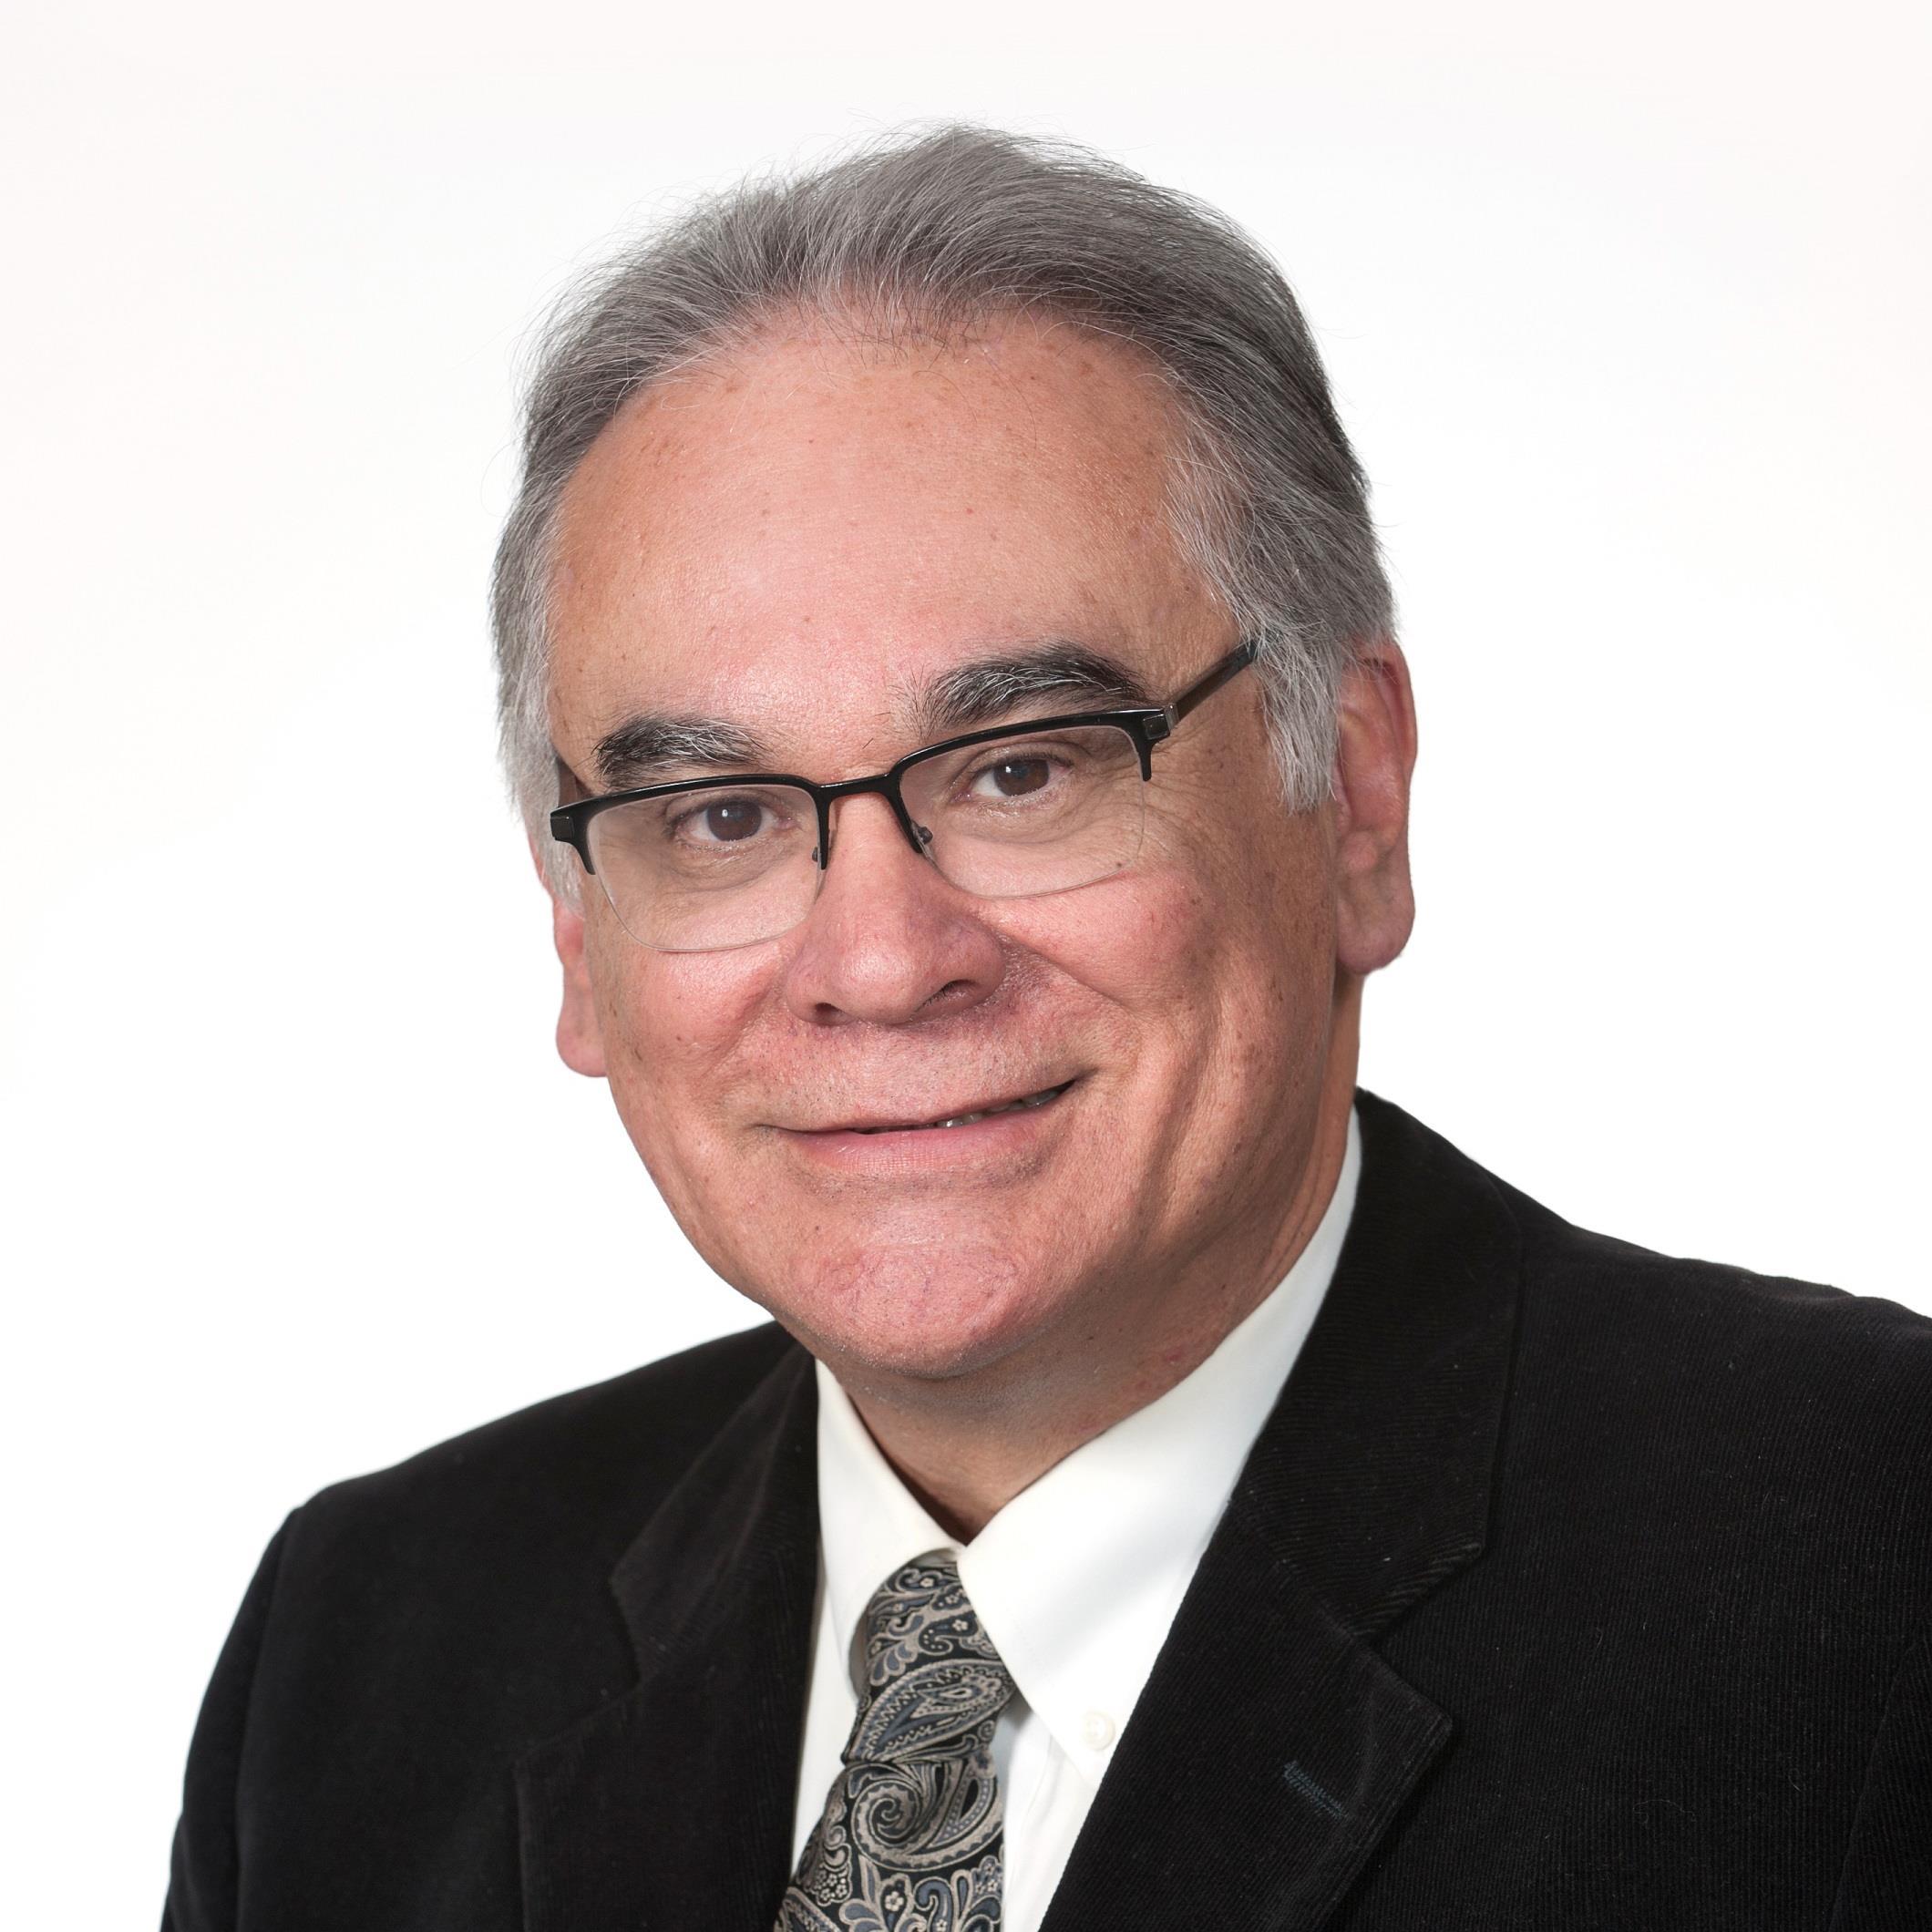 David A. Acosta, MD_Headshot1 2.jpg